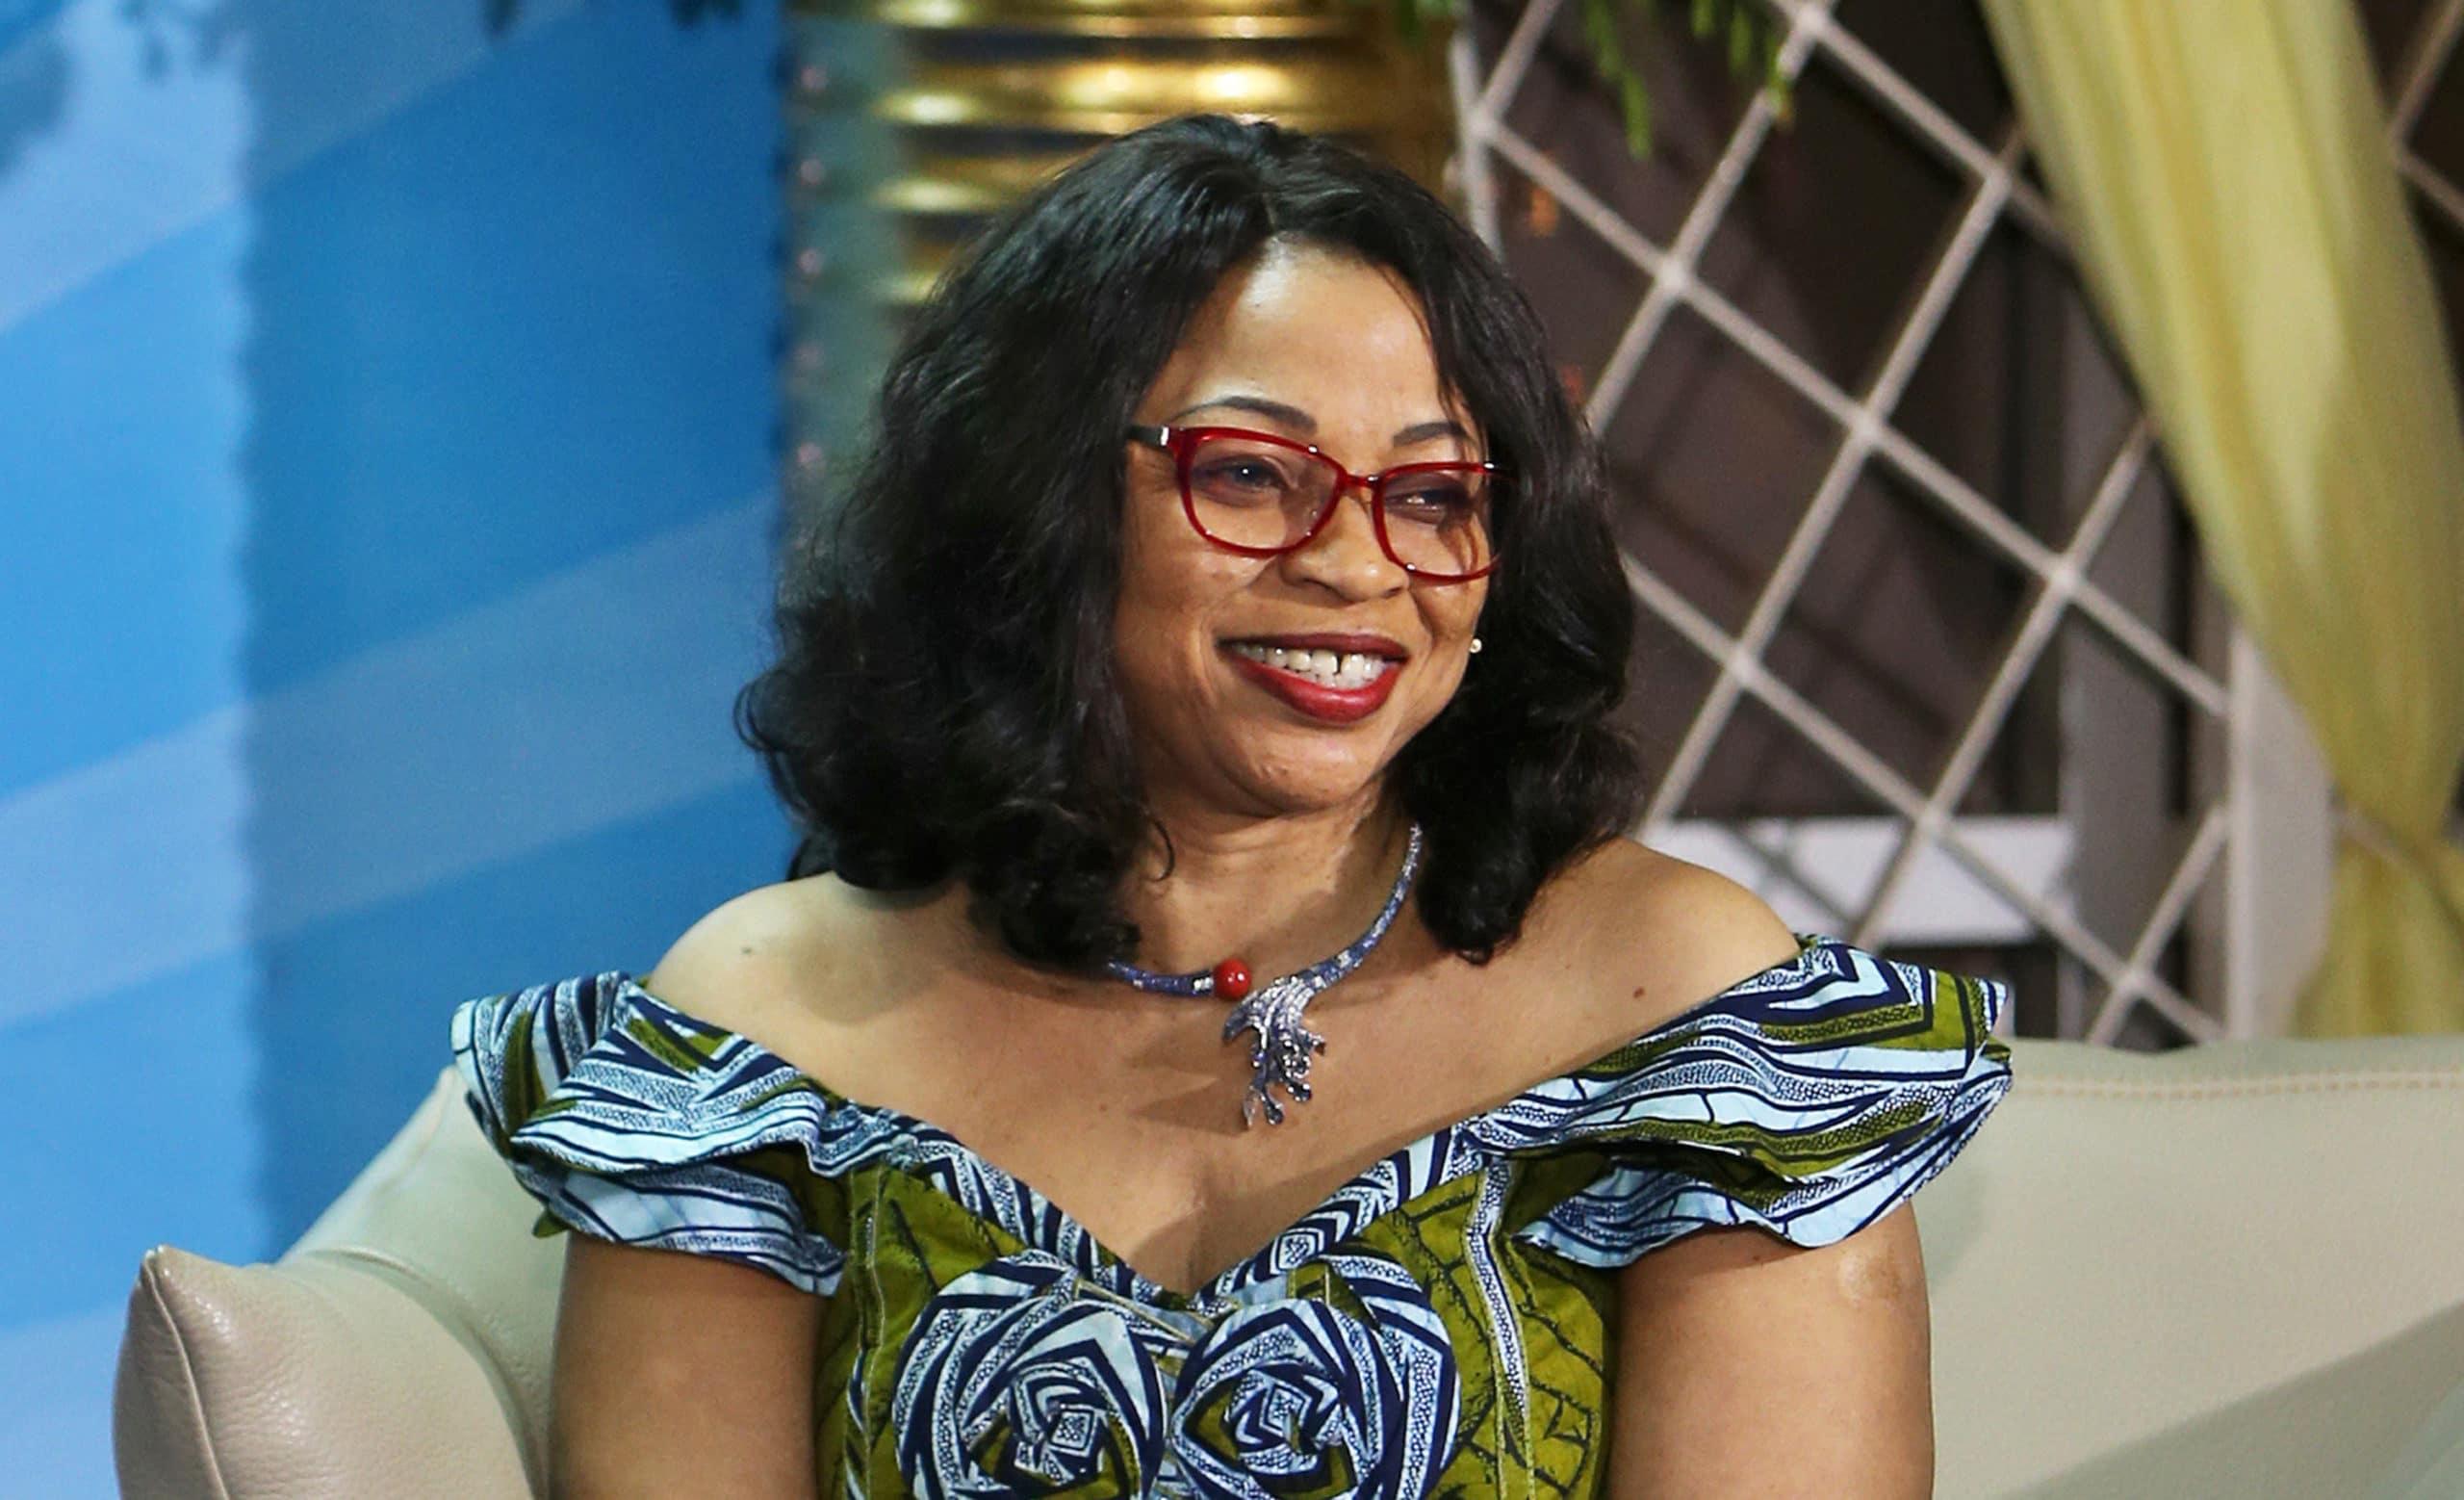 Interview With Nigeria's Richest Woman, Billionaire Folorunso Alakija